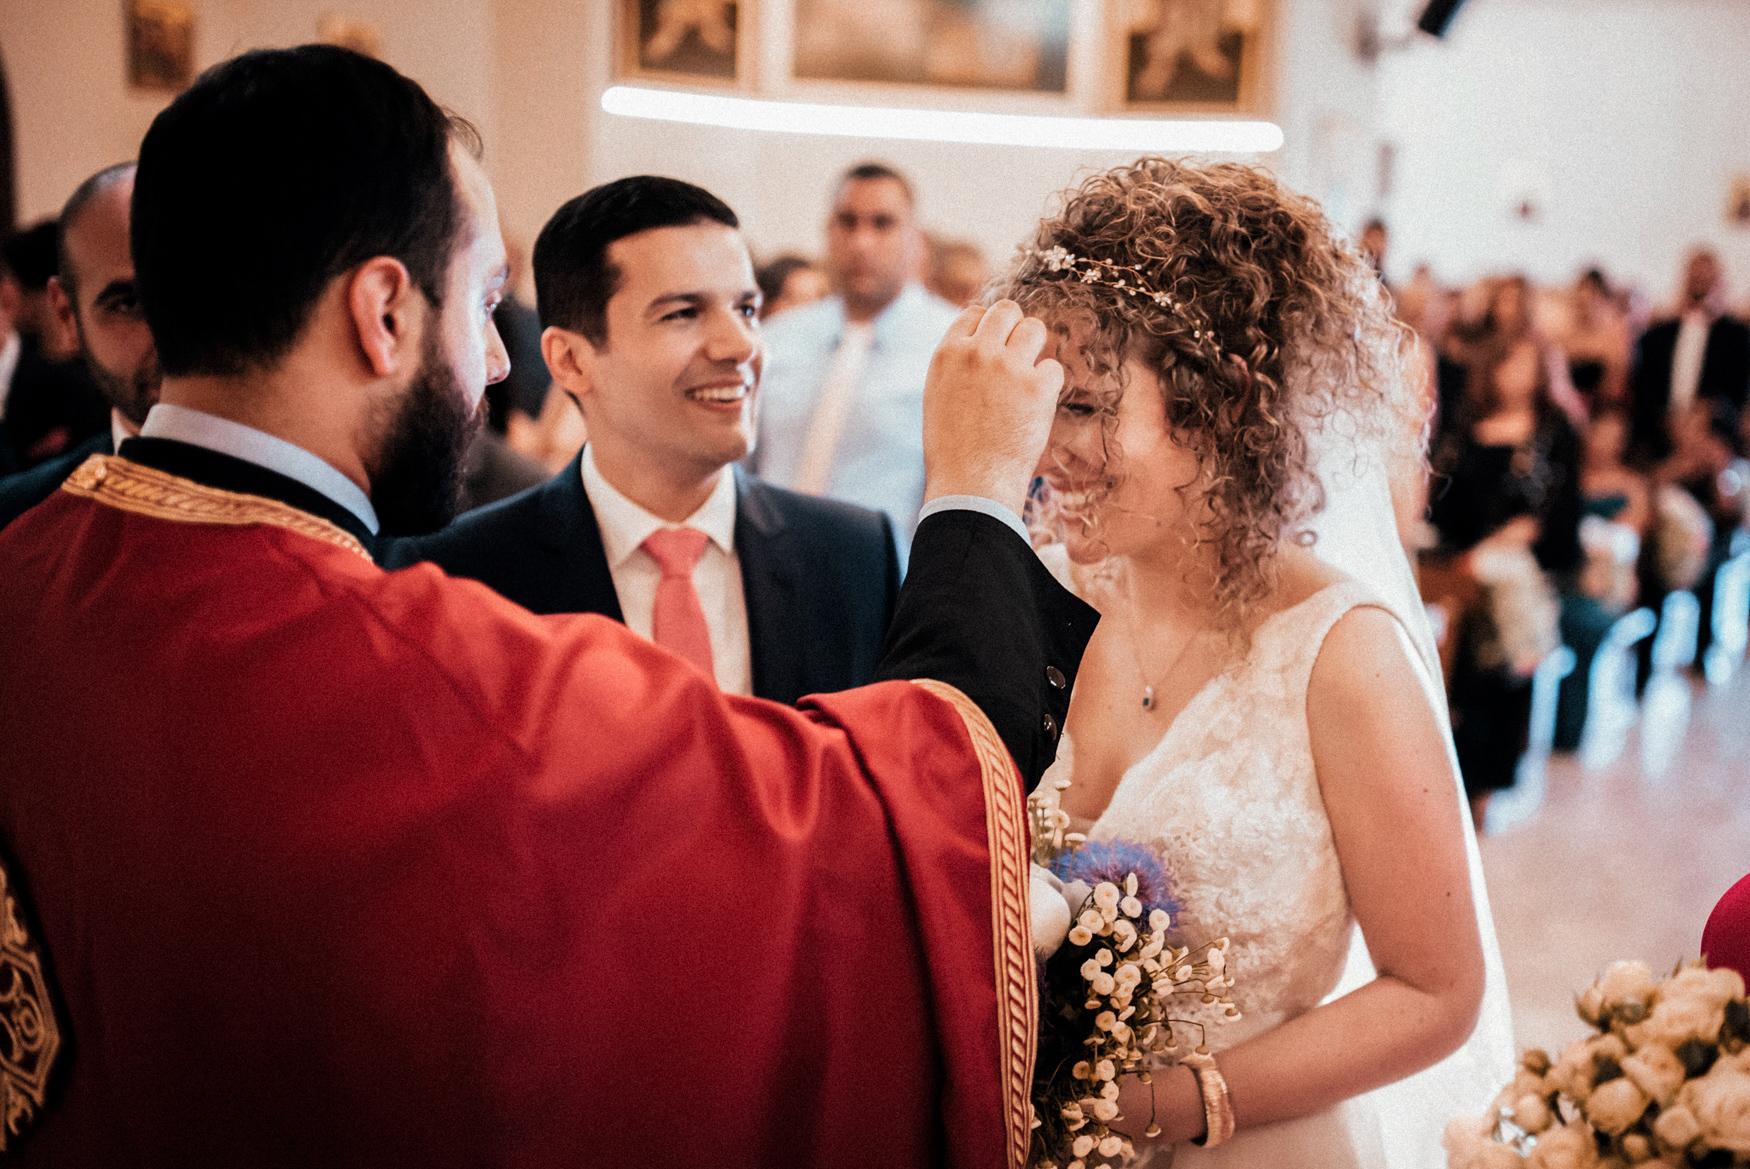 LR3 byblos beirut church wedding ceremony lebanon 005.jpg